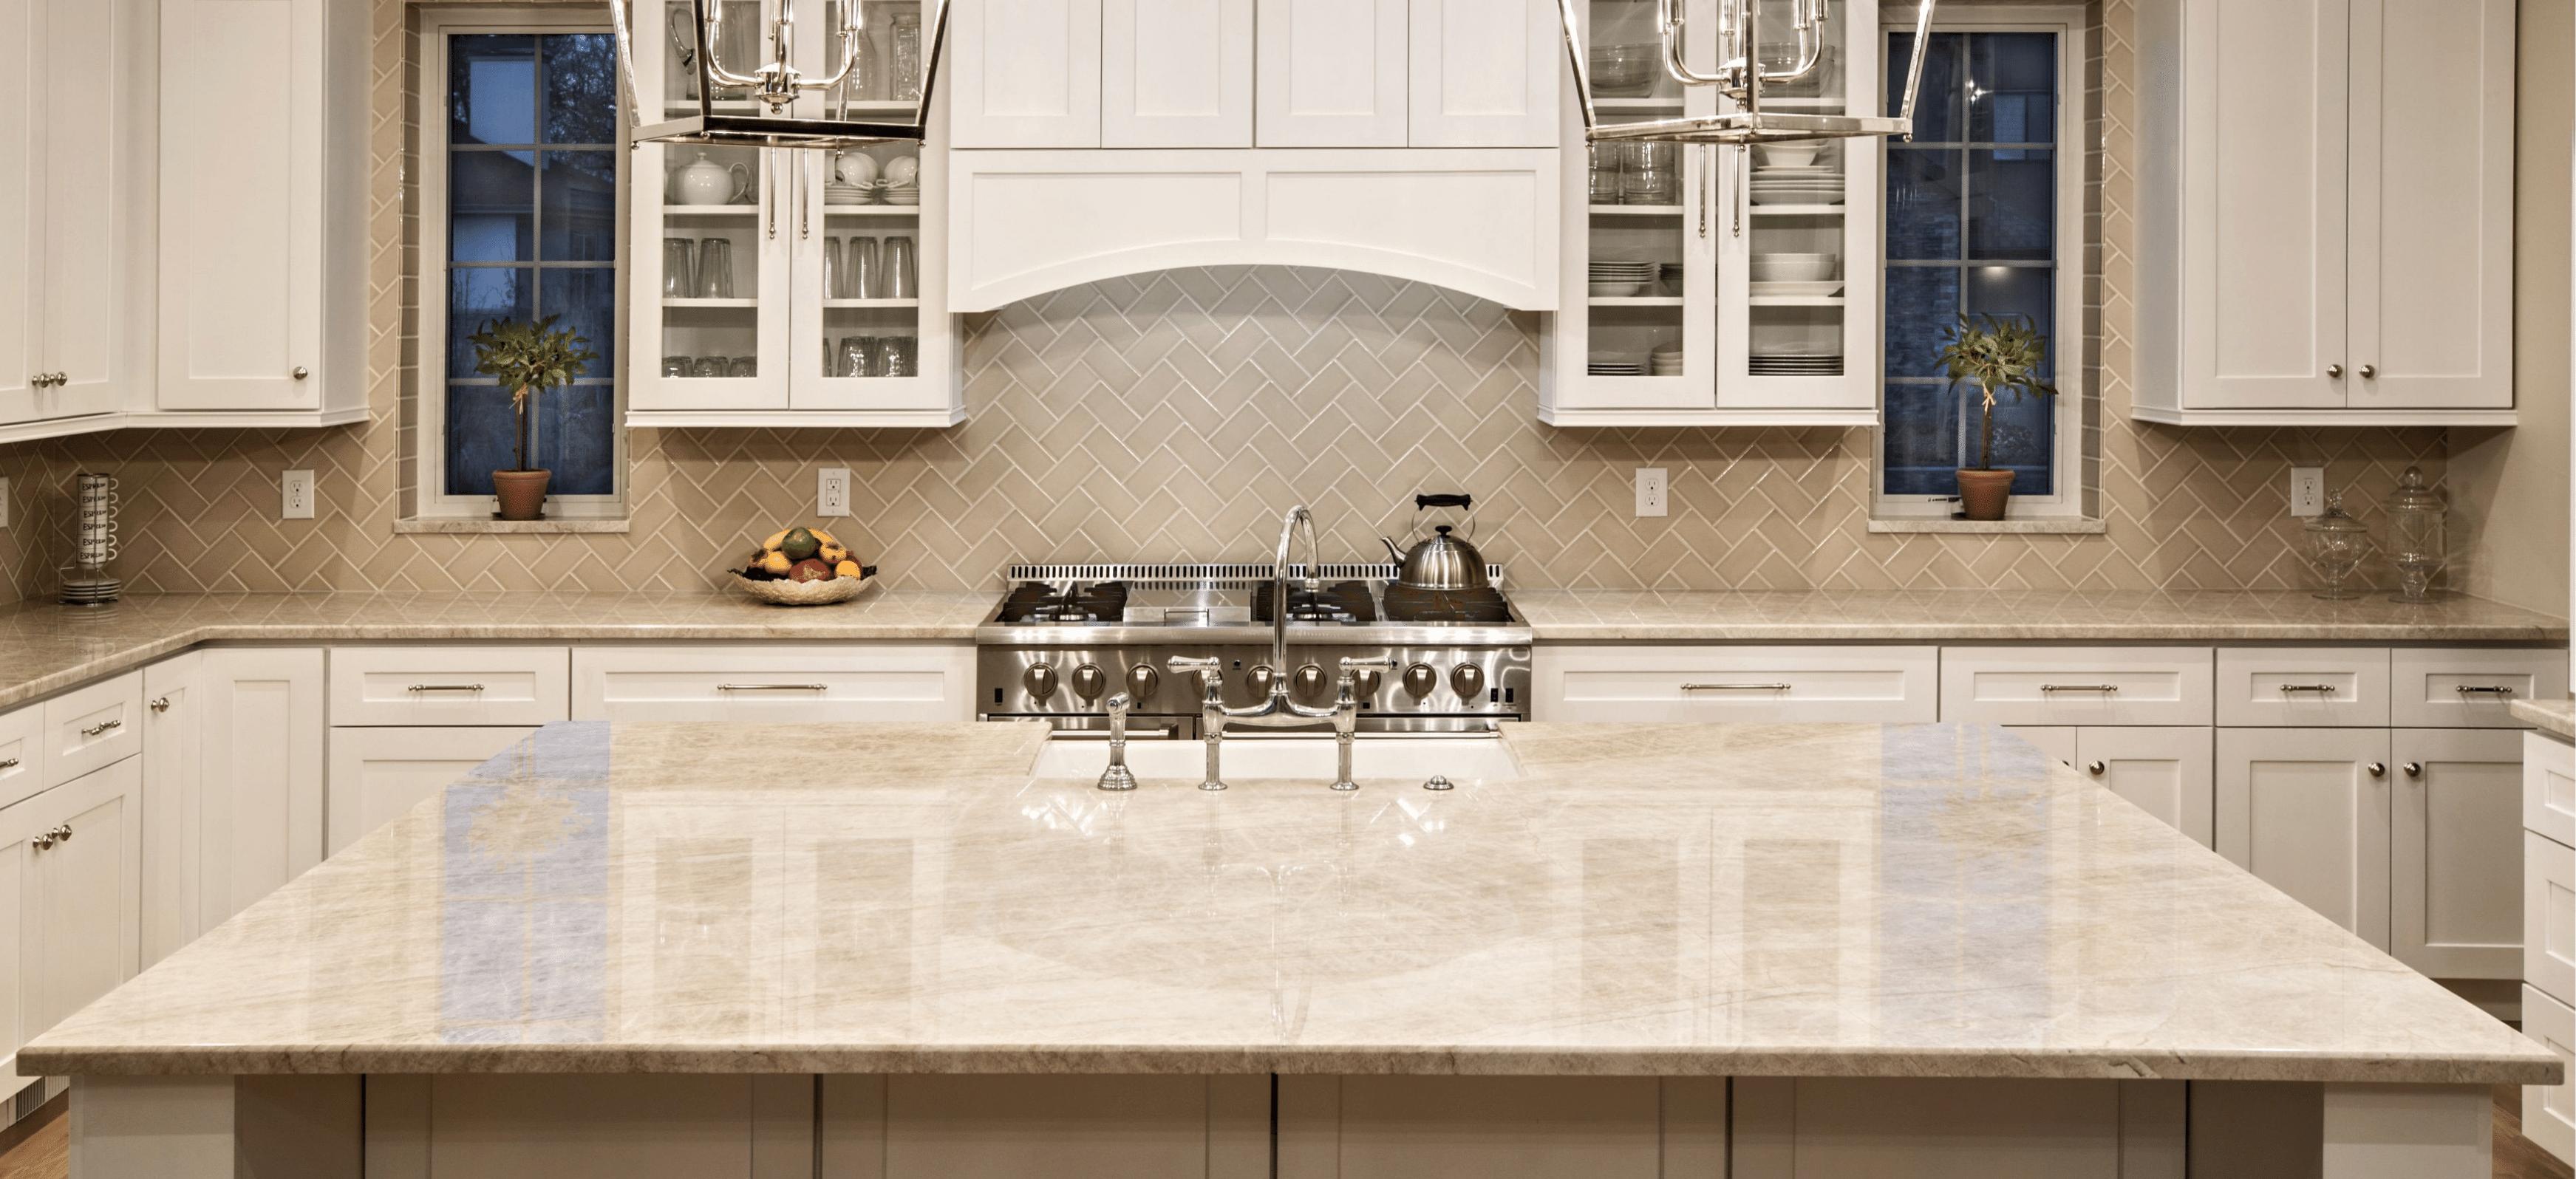 Taj Mahal Quartzite Kitchen Countertops and Island with Cream Subway Tile Backsplash Natural Stone Countertops